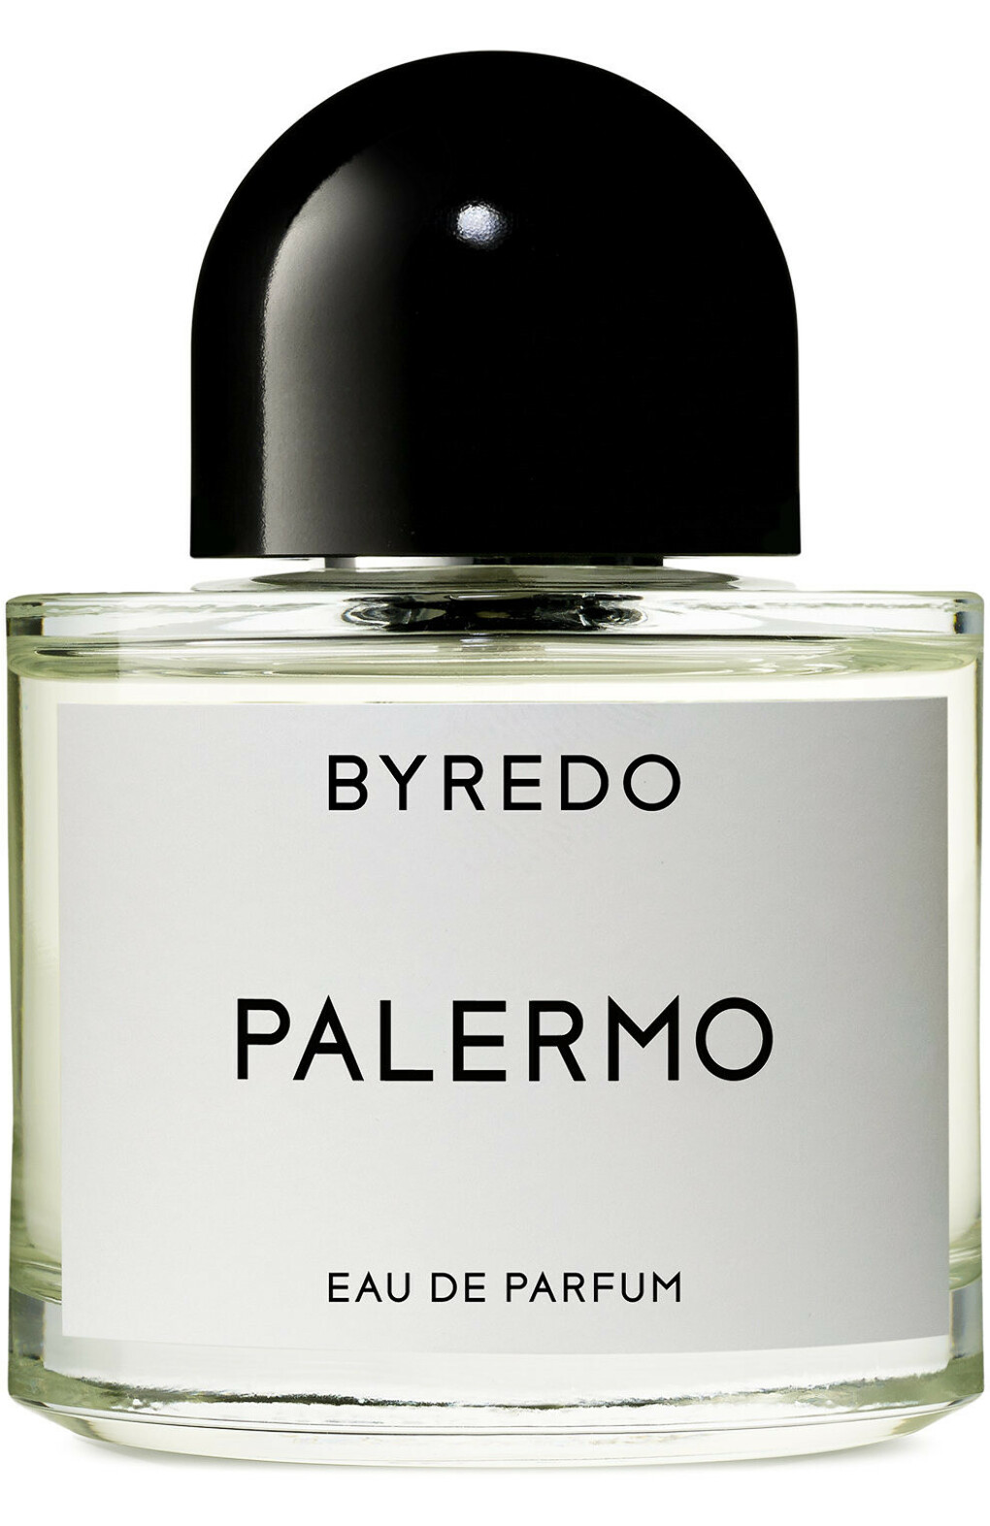 Парфюмерная вода Palermo BYREDO — купить за 12600 руб. в интернет-магазине ЦУМ, арт. BR806106